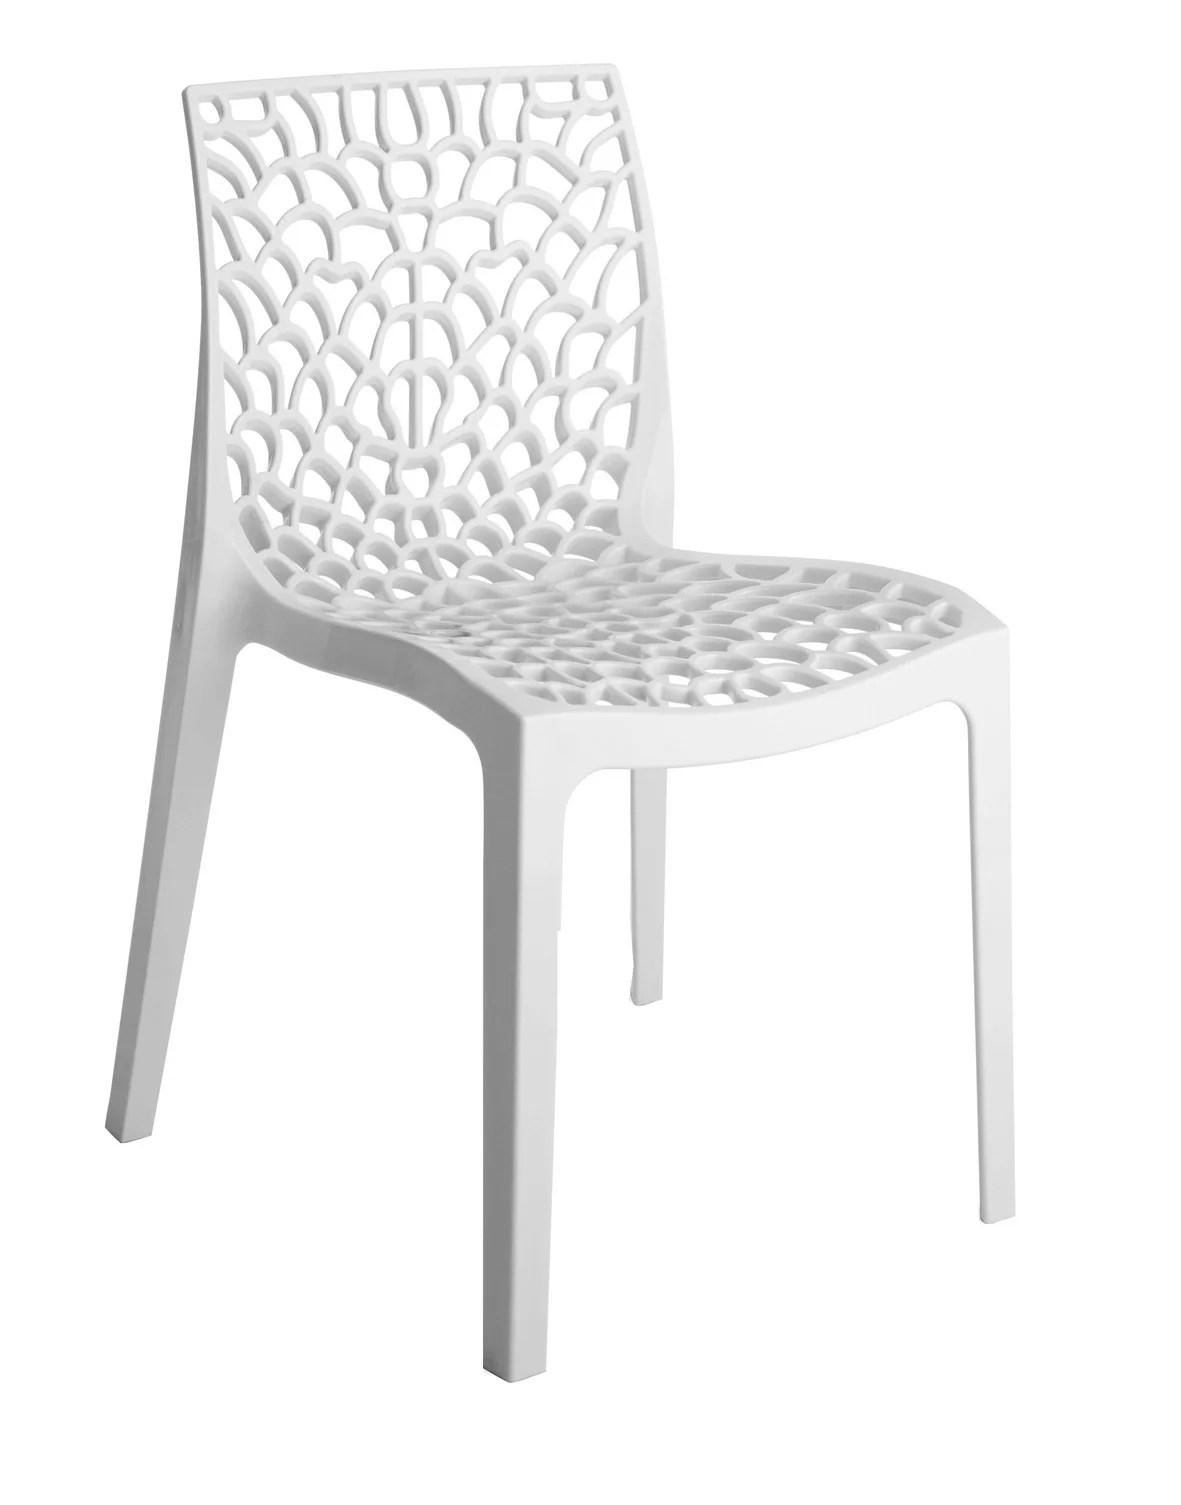 chaise de jardin en polypropylene grafik blanc